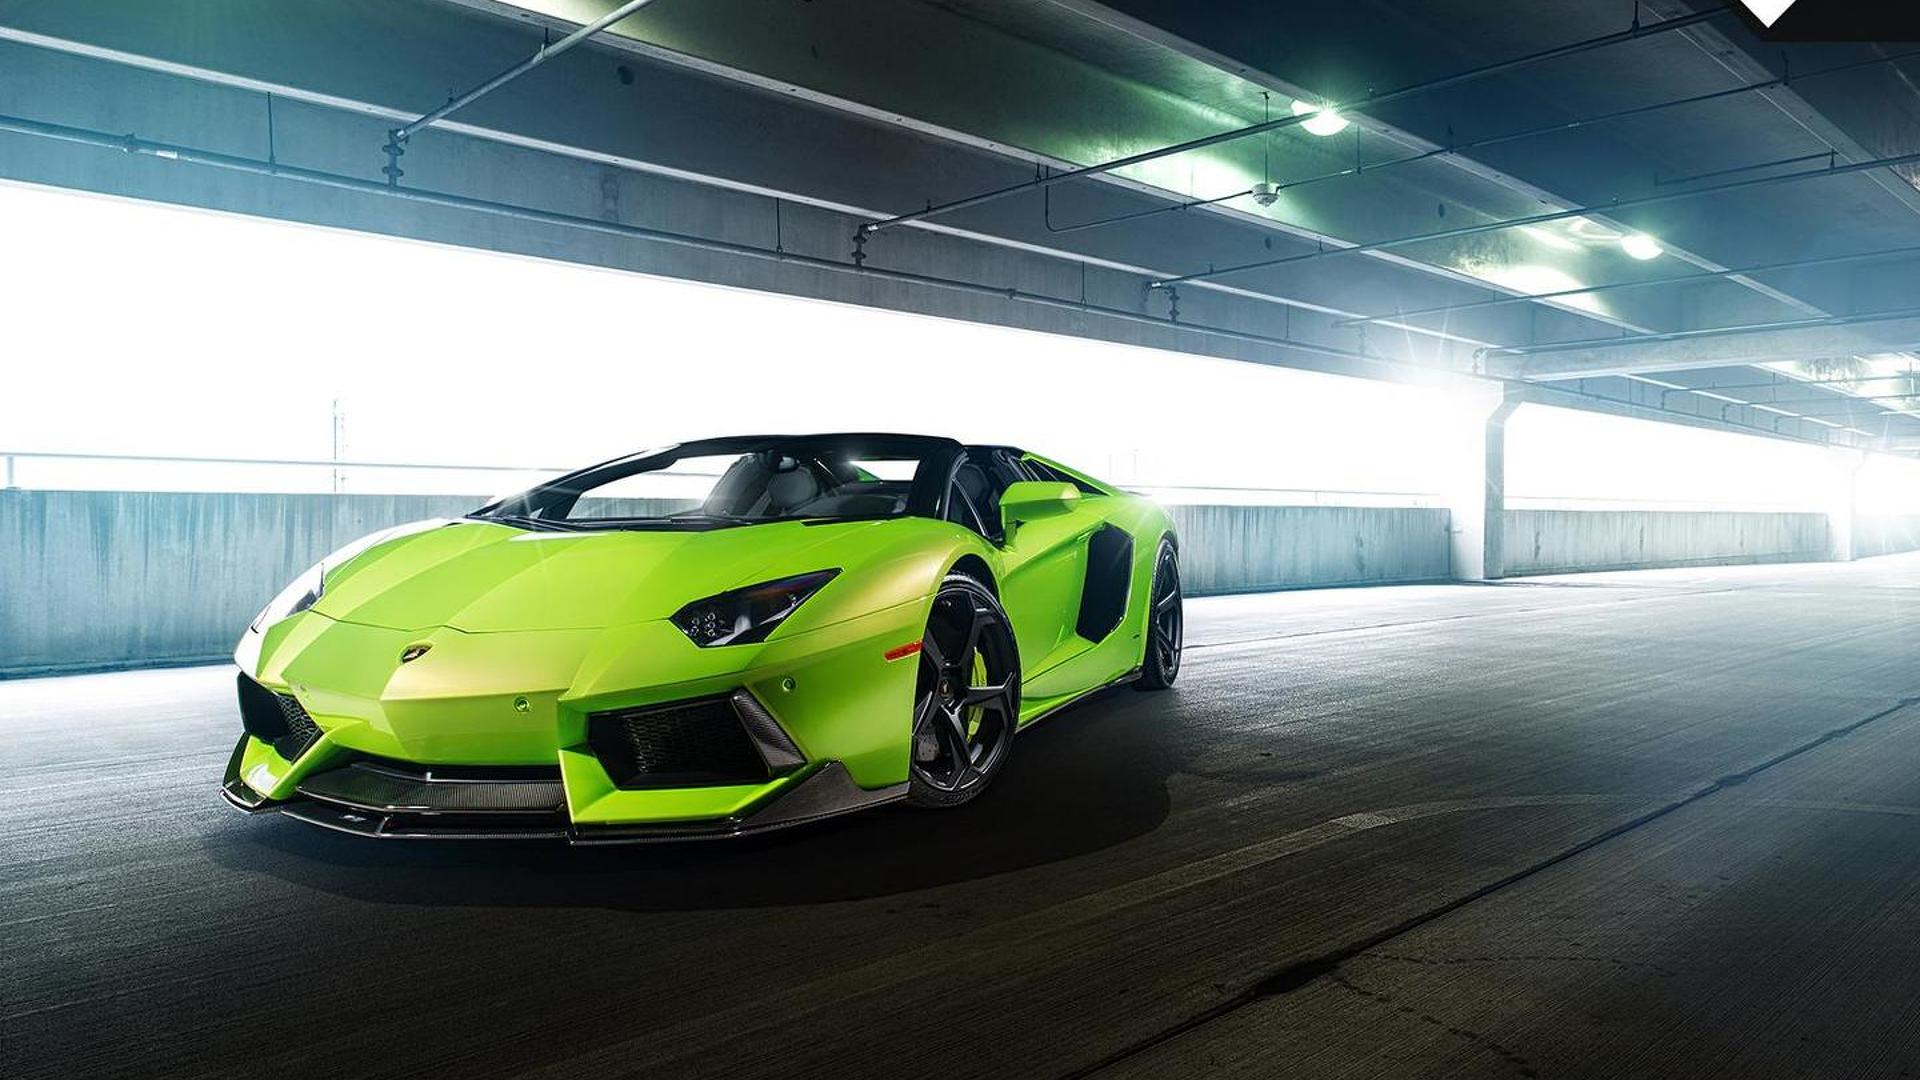 Суперкар Lamborghini Aventador-V Roadster The Hulk от Vosteiner